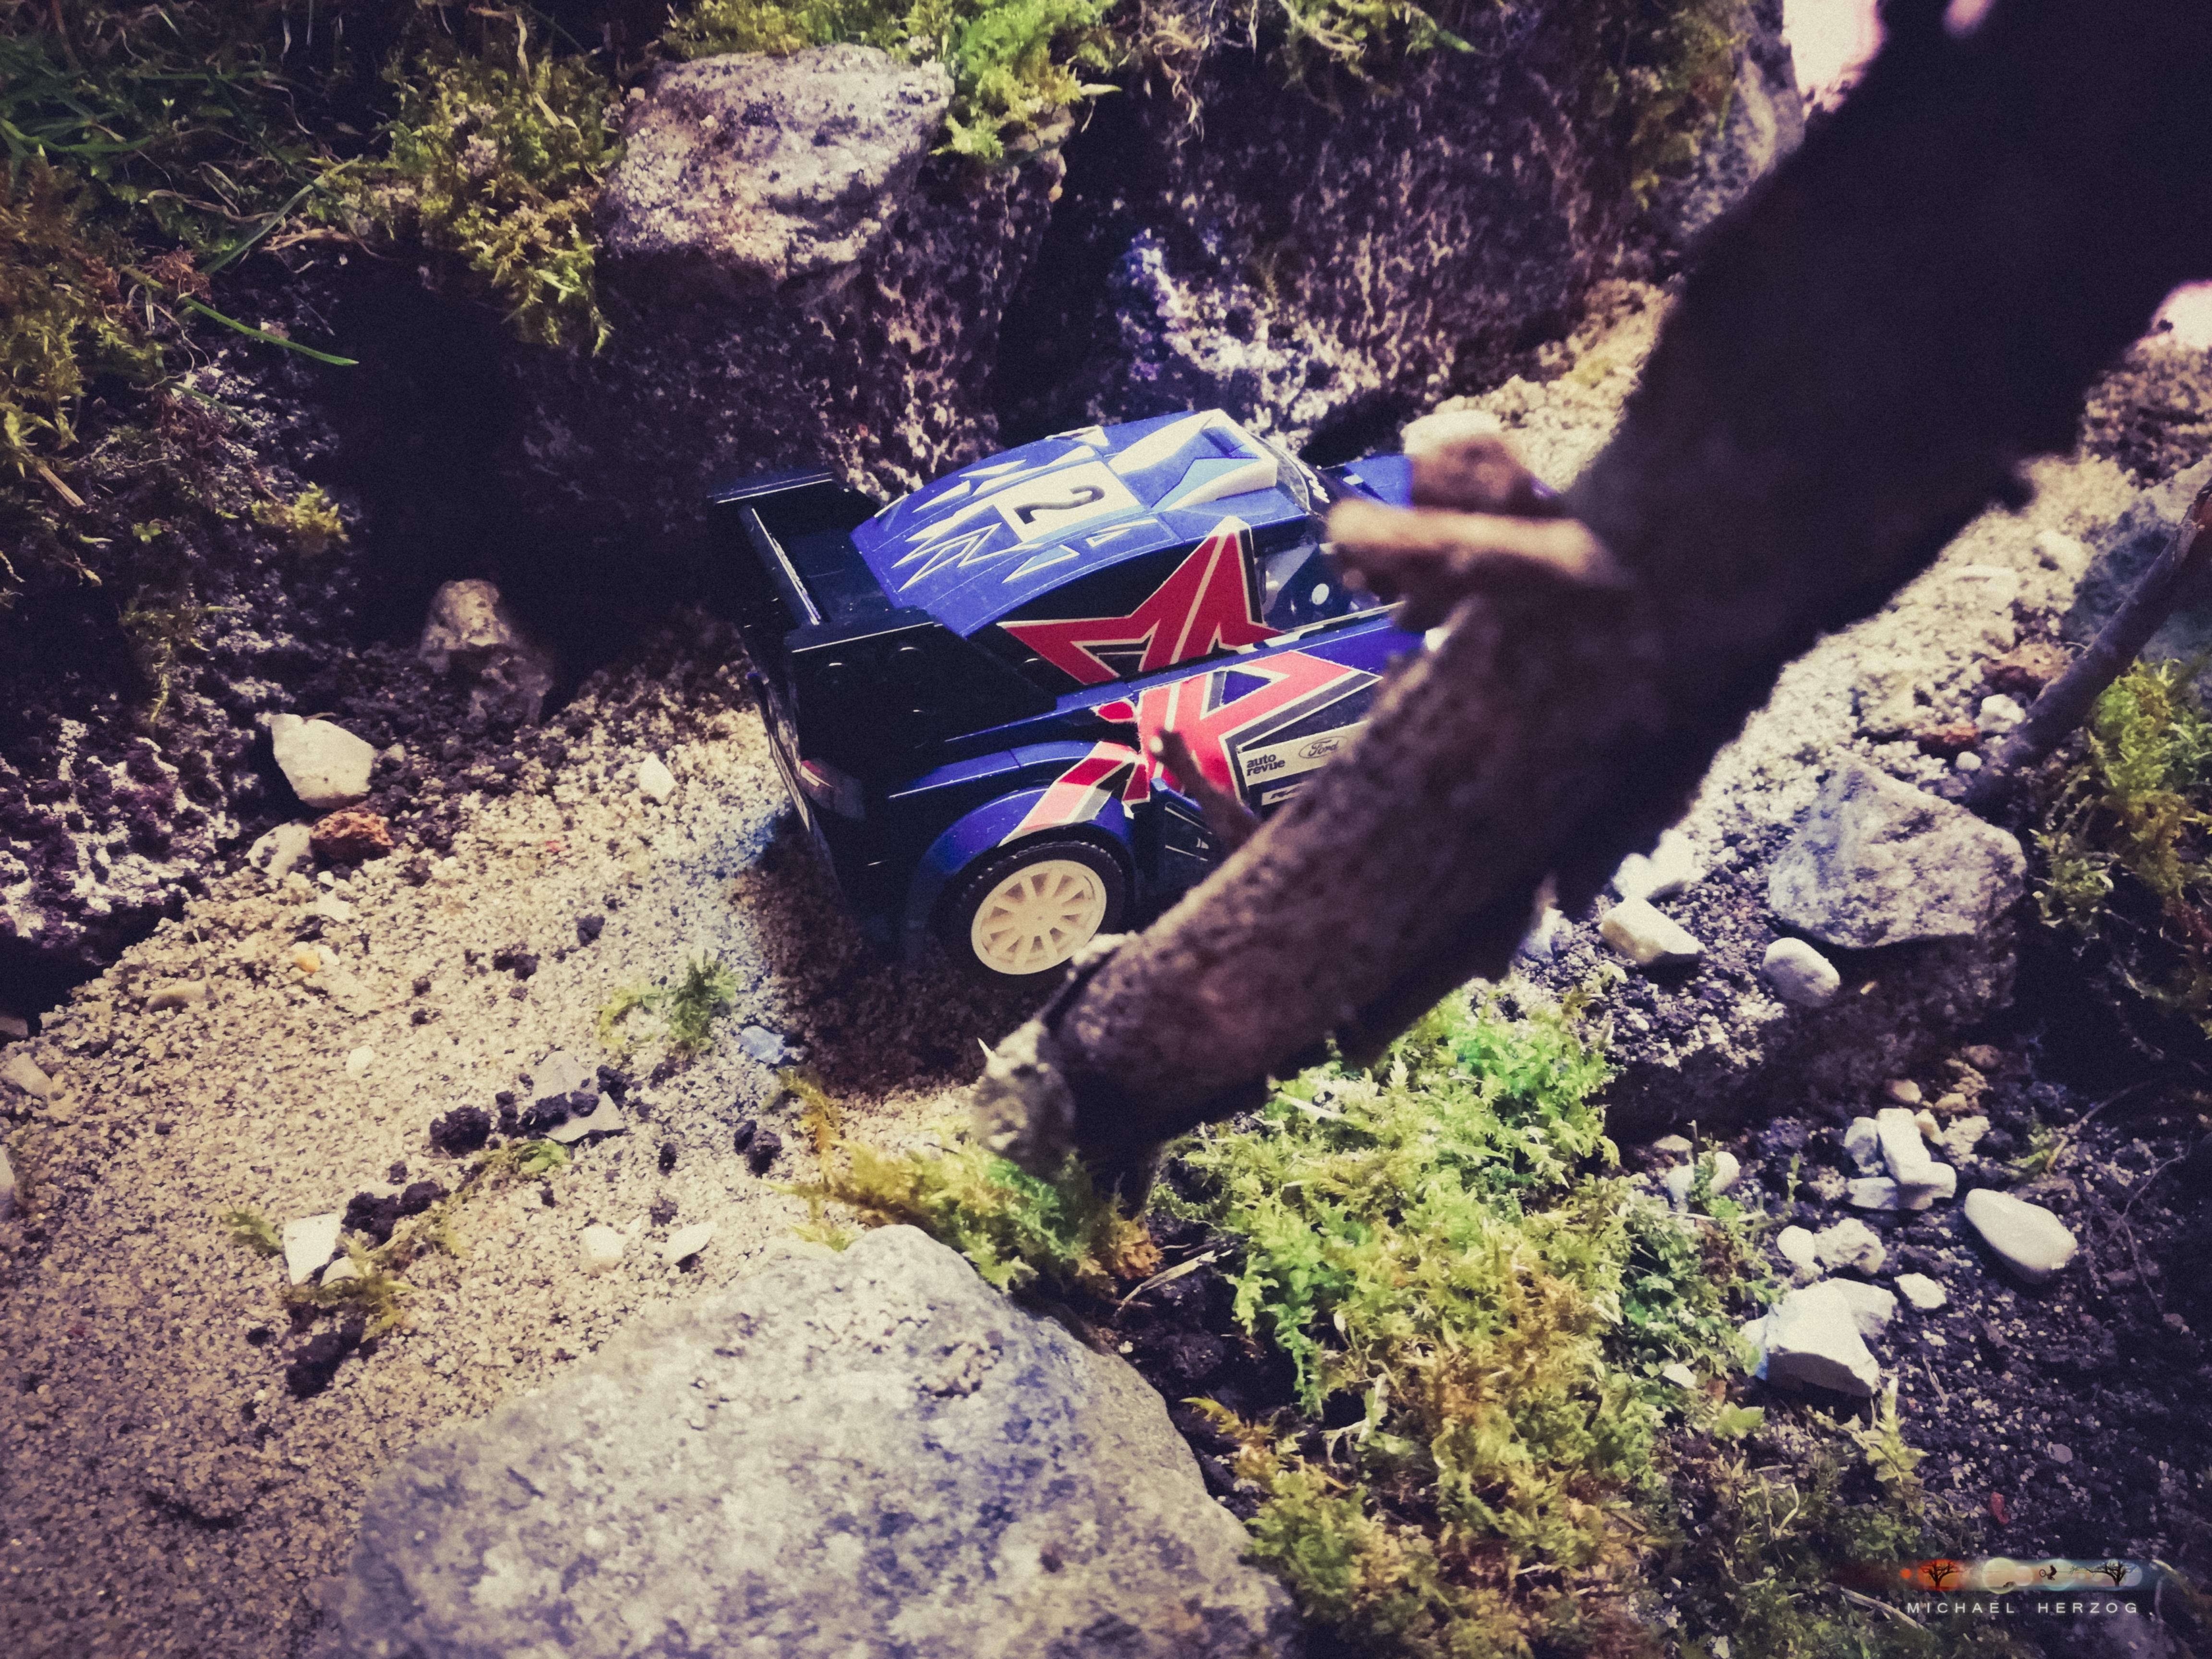 RacingRookie2019_Lego-Ford-Fiesta_Speedchampion_RookieEdition_AUTrenalinStudios-15.jpg